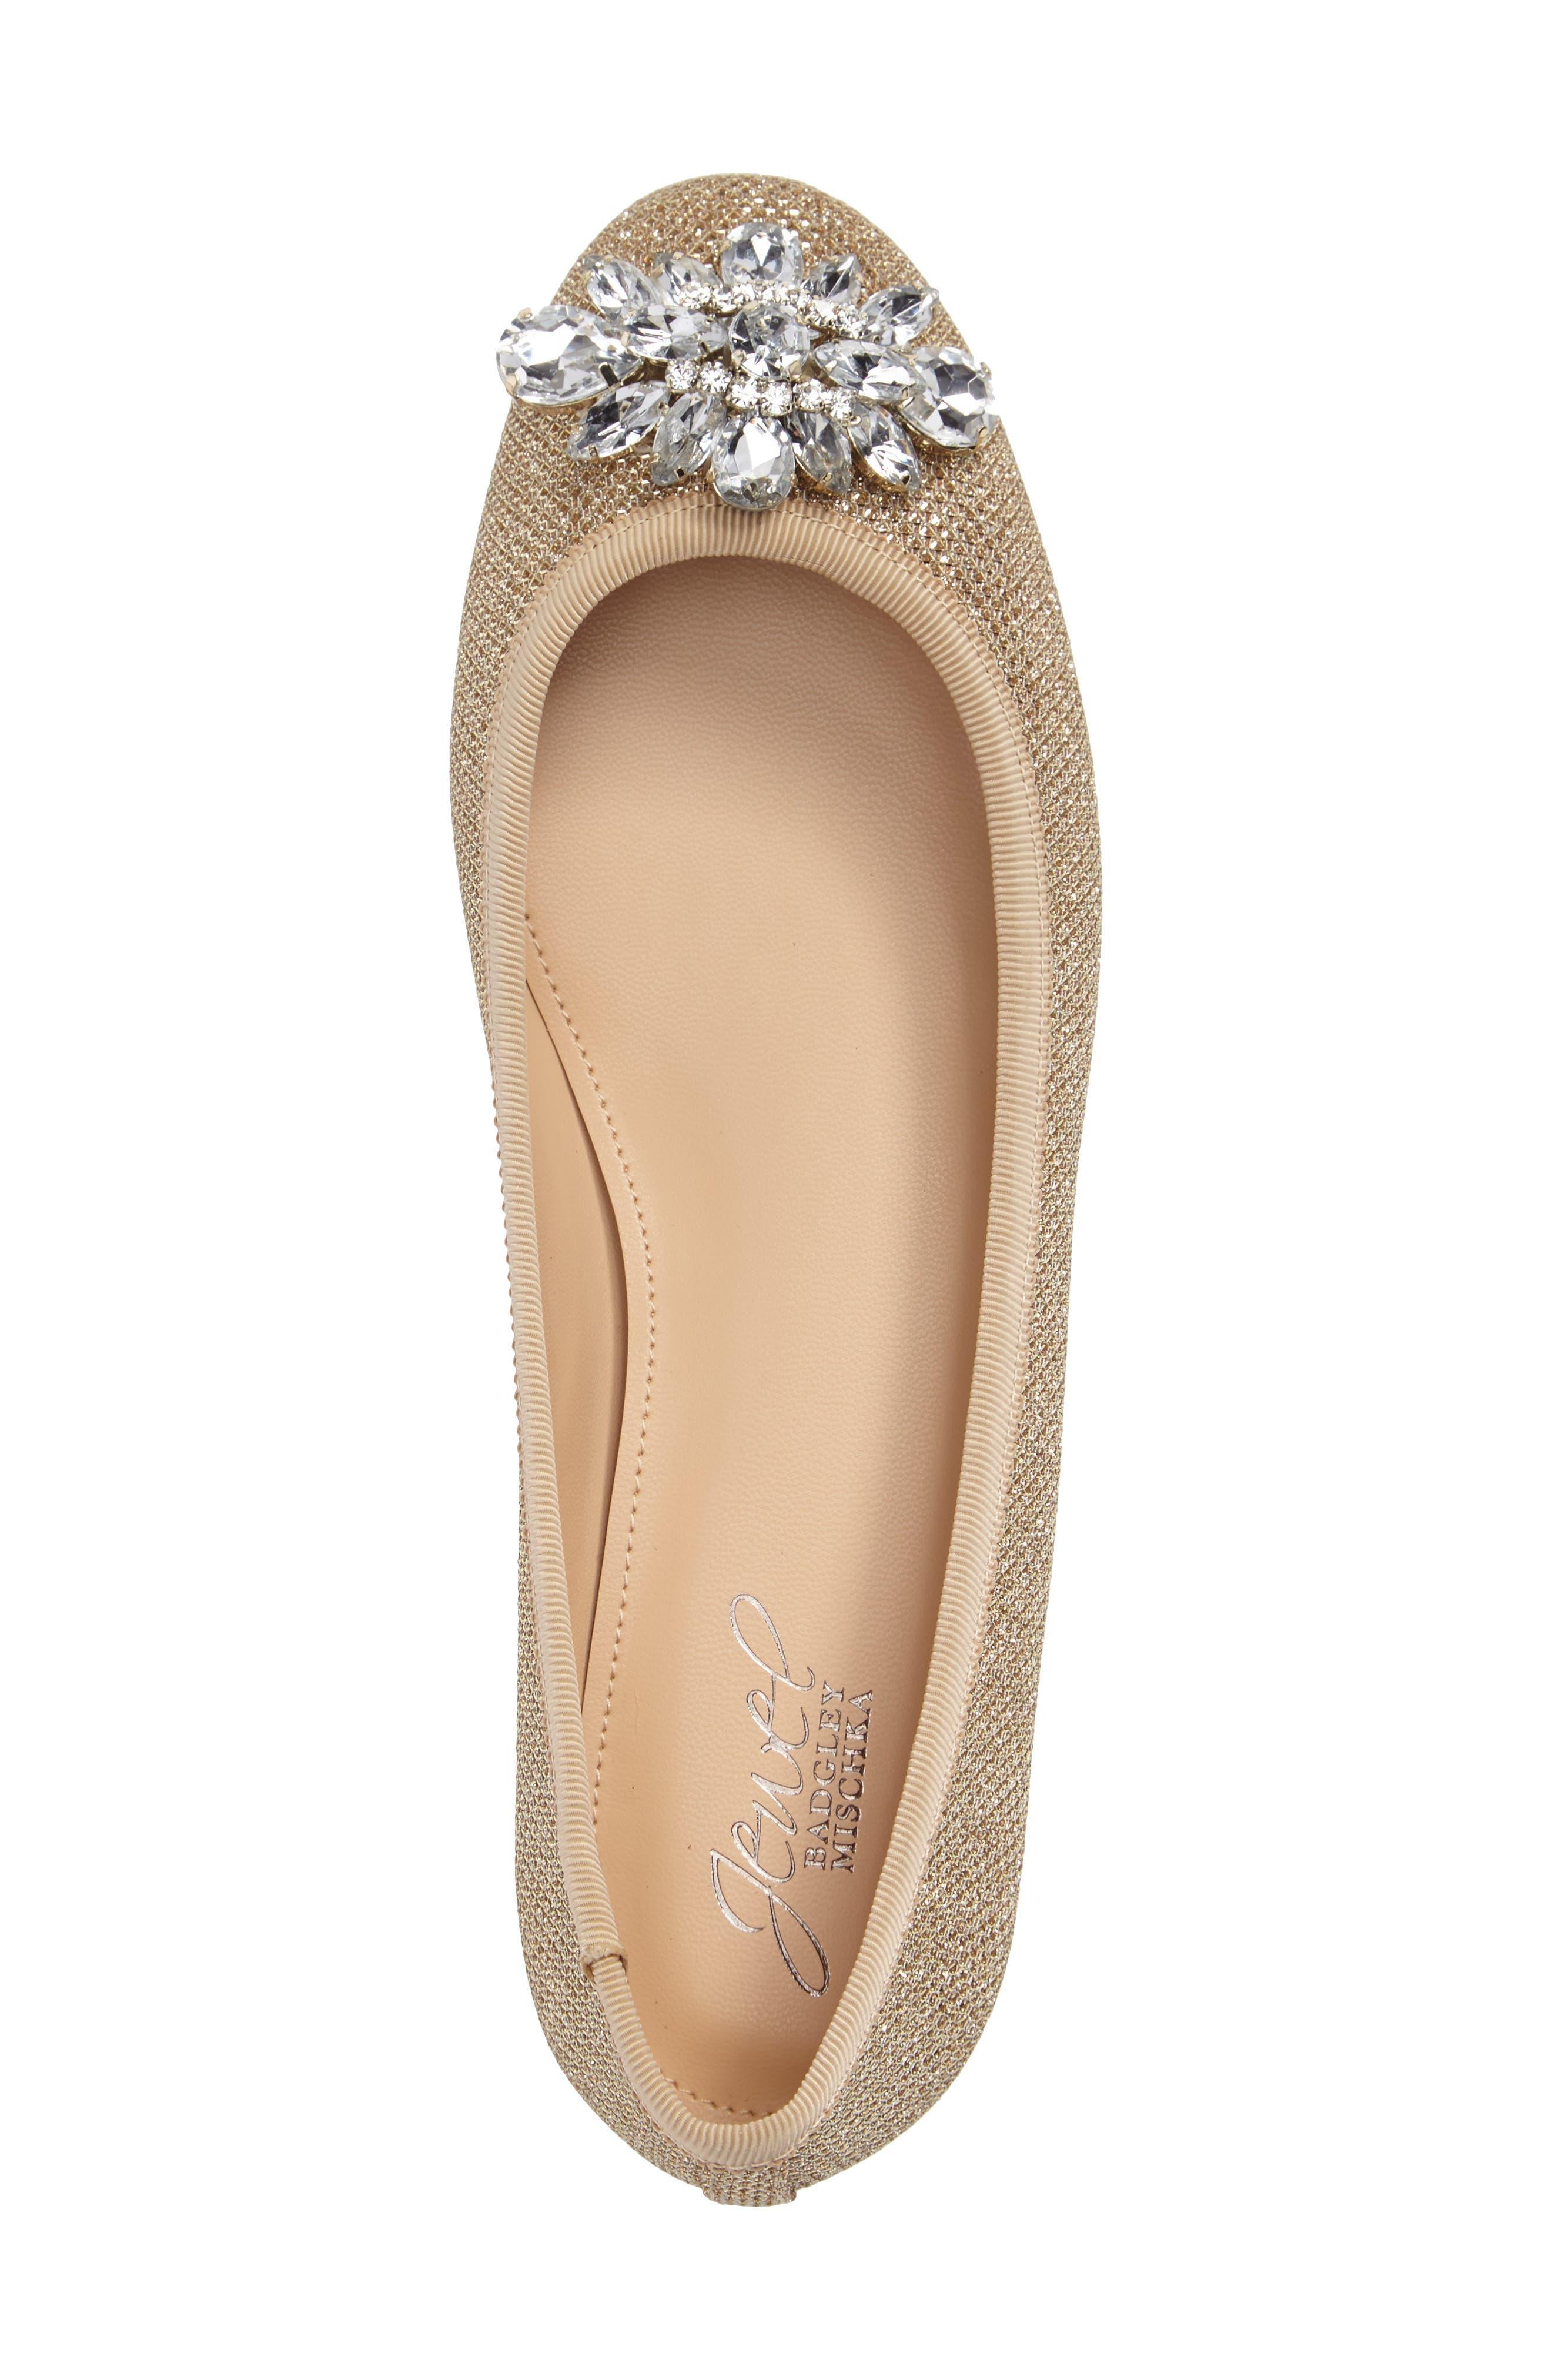 Cabella Embellished Ballet Flat,                             Alternate thumbnail 3, color,                             GOLD FABRIC